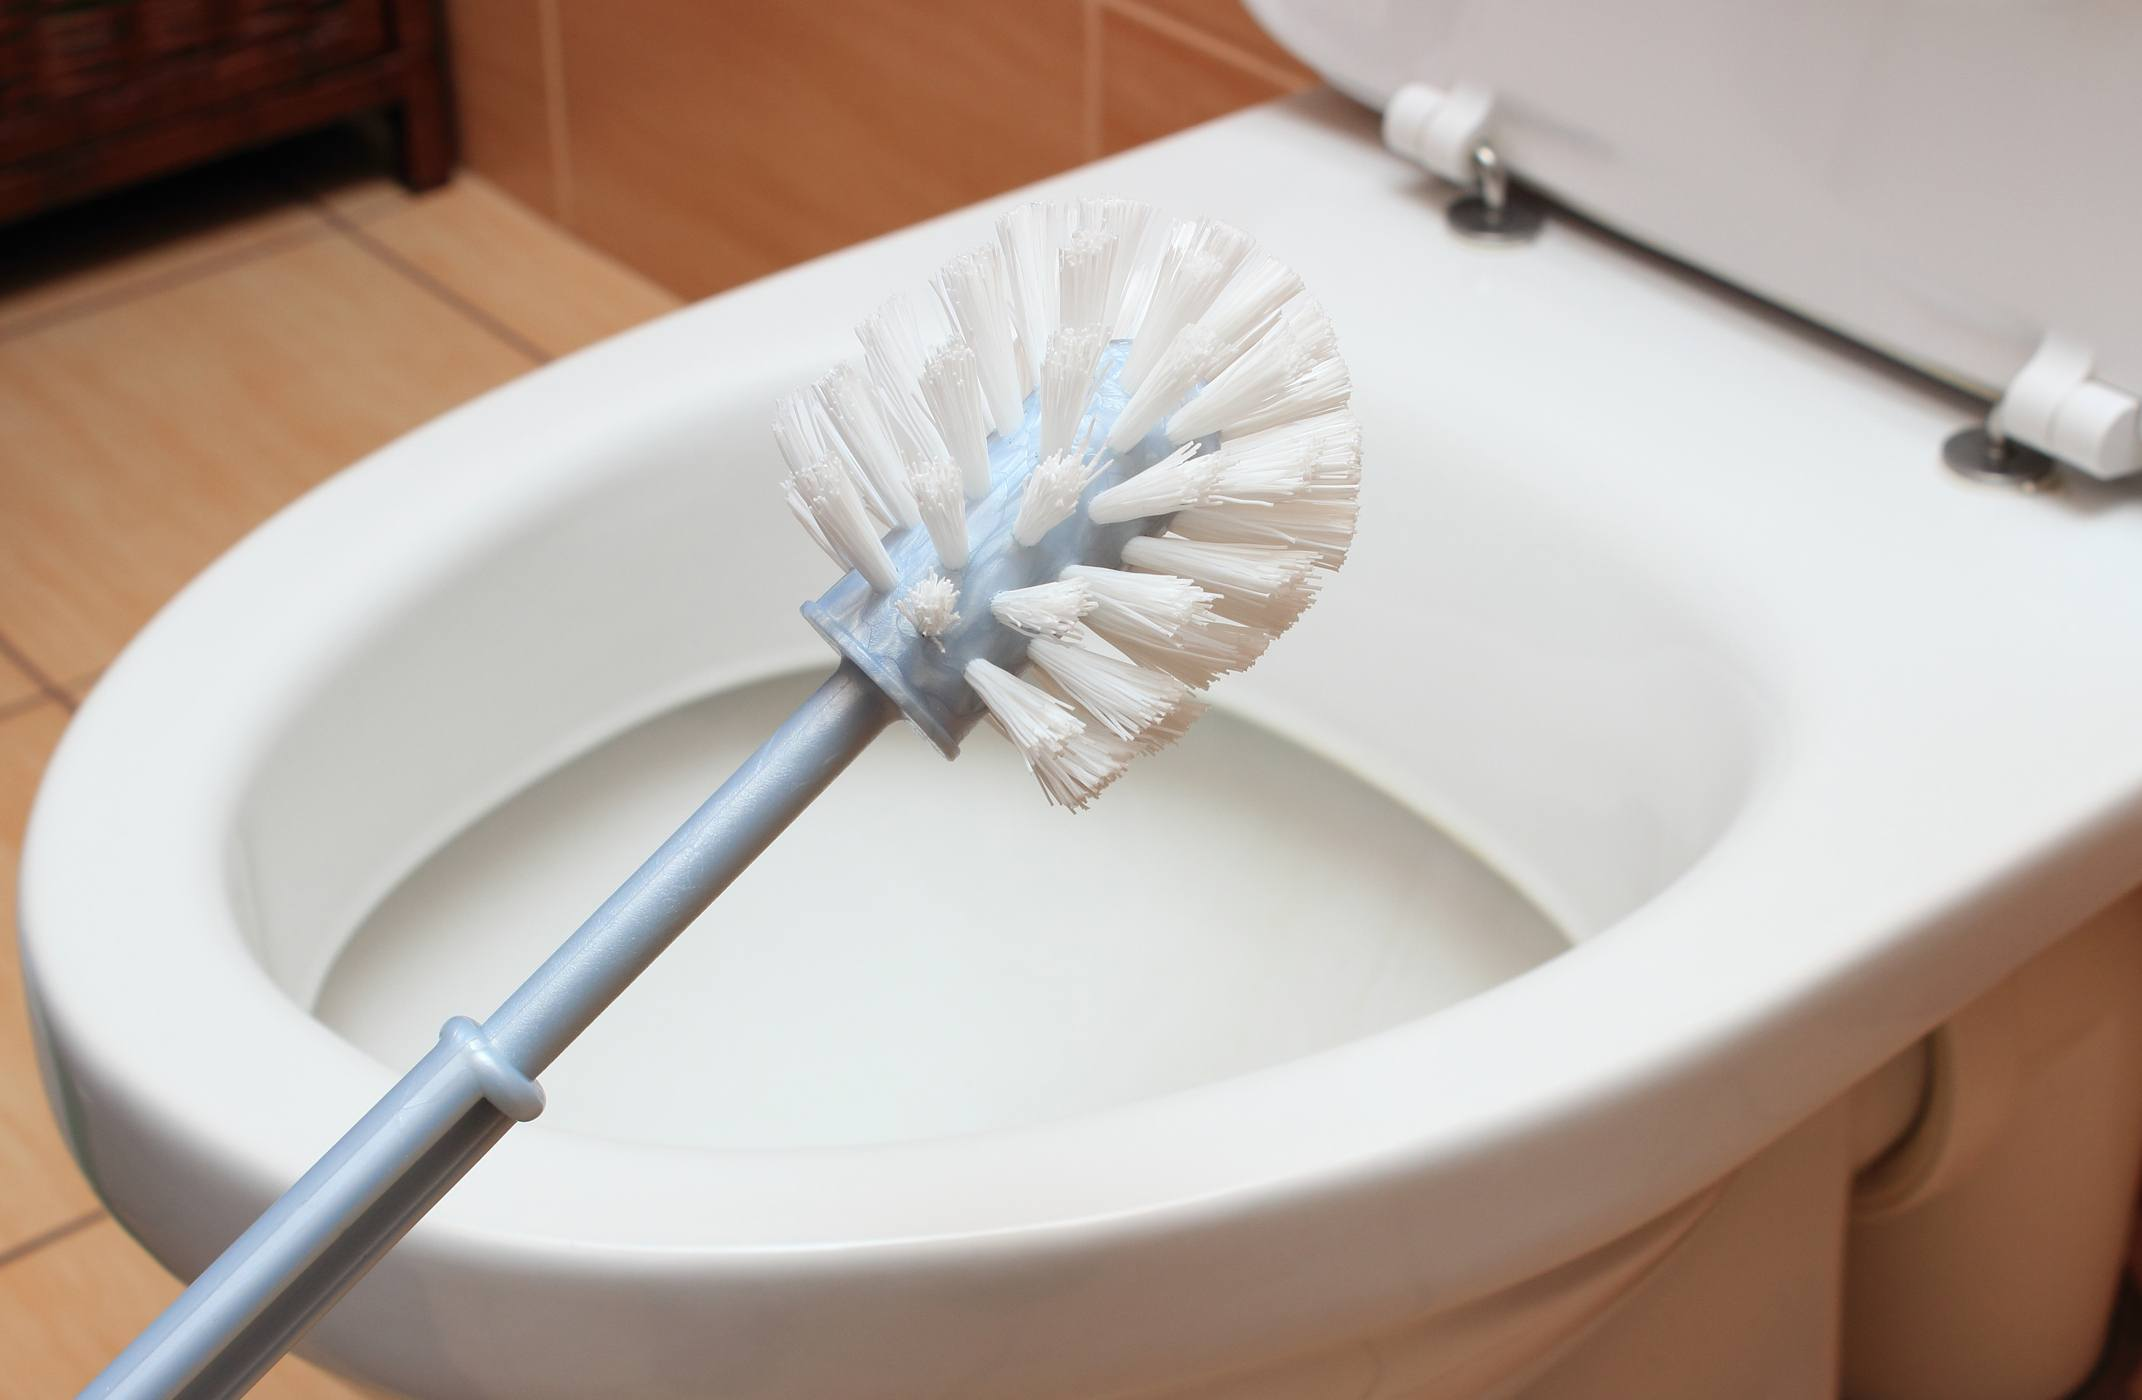 Toilet brush cleaning toilet